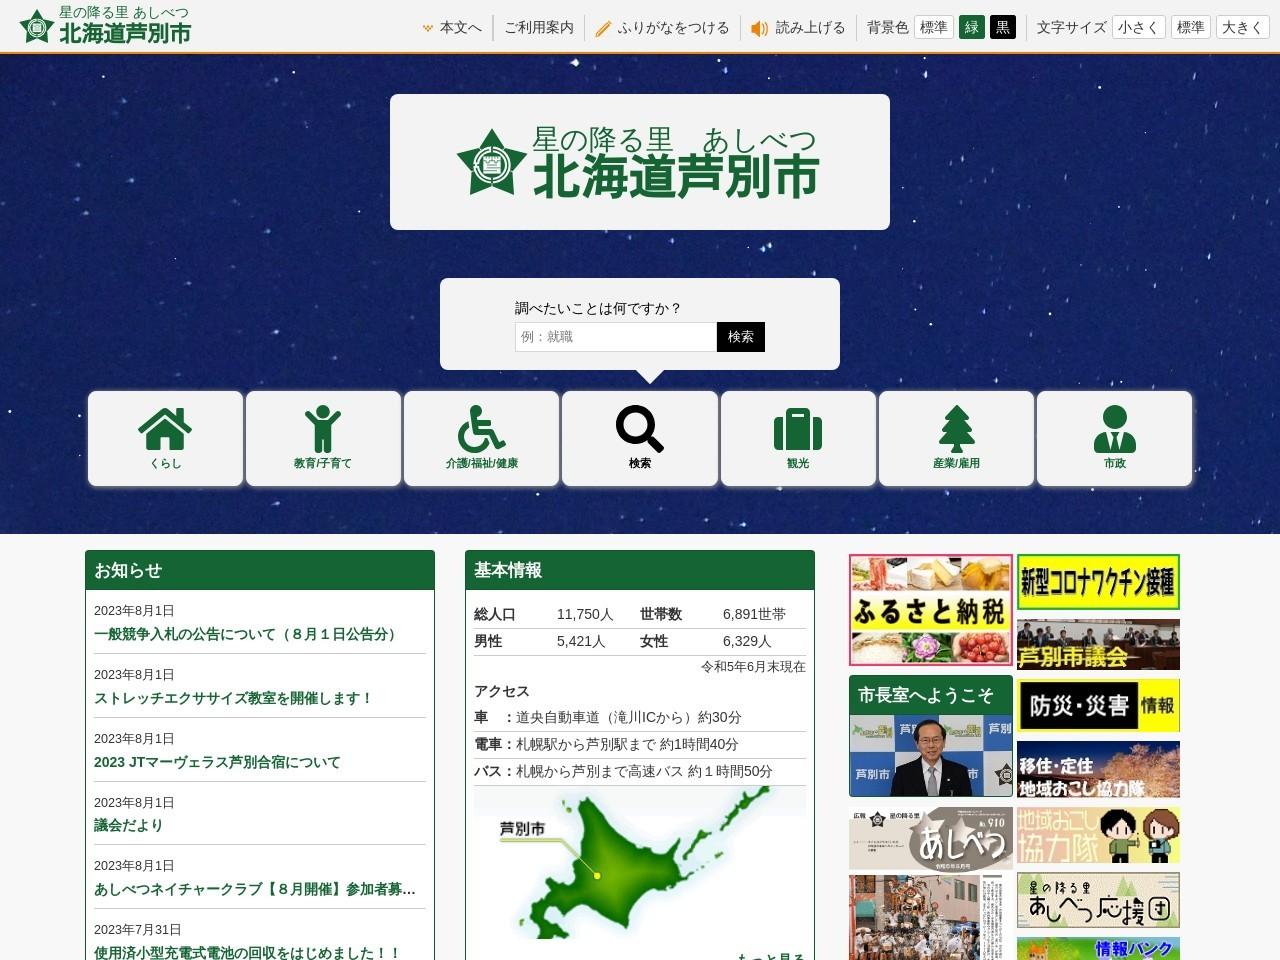 http://www.city.ashibetsu.hokkaido.jp/syokokanko/kankou/kankou/ski_open_4_2_2_2.html